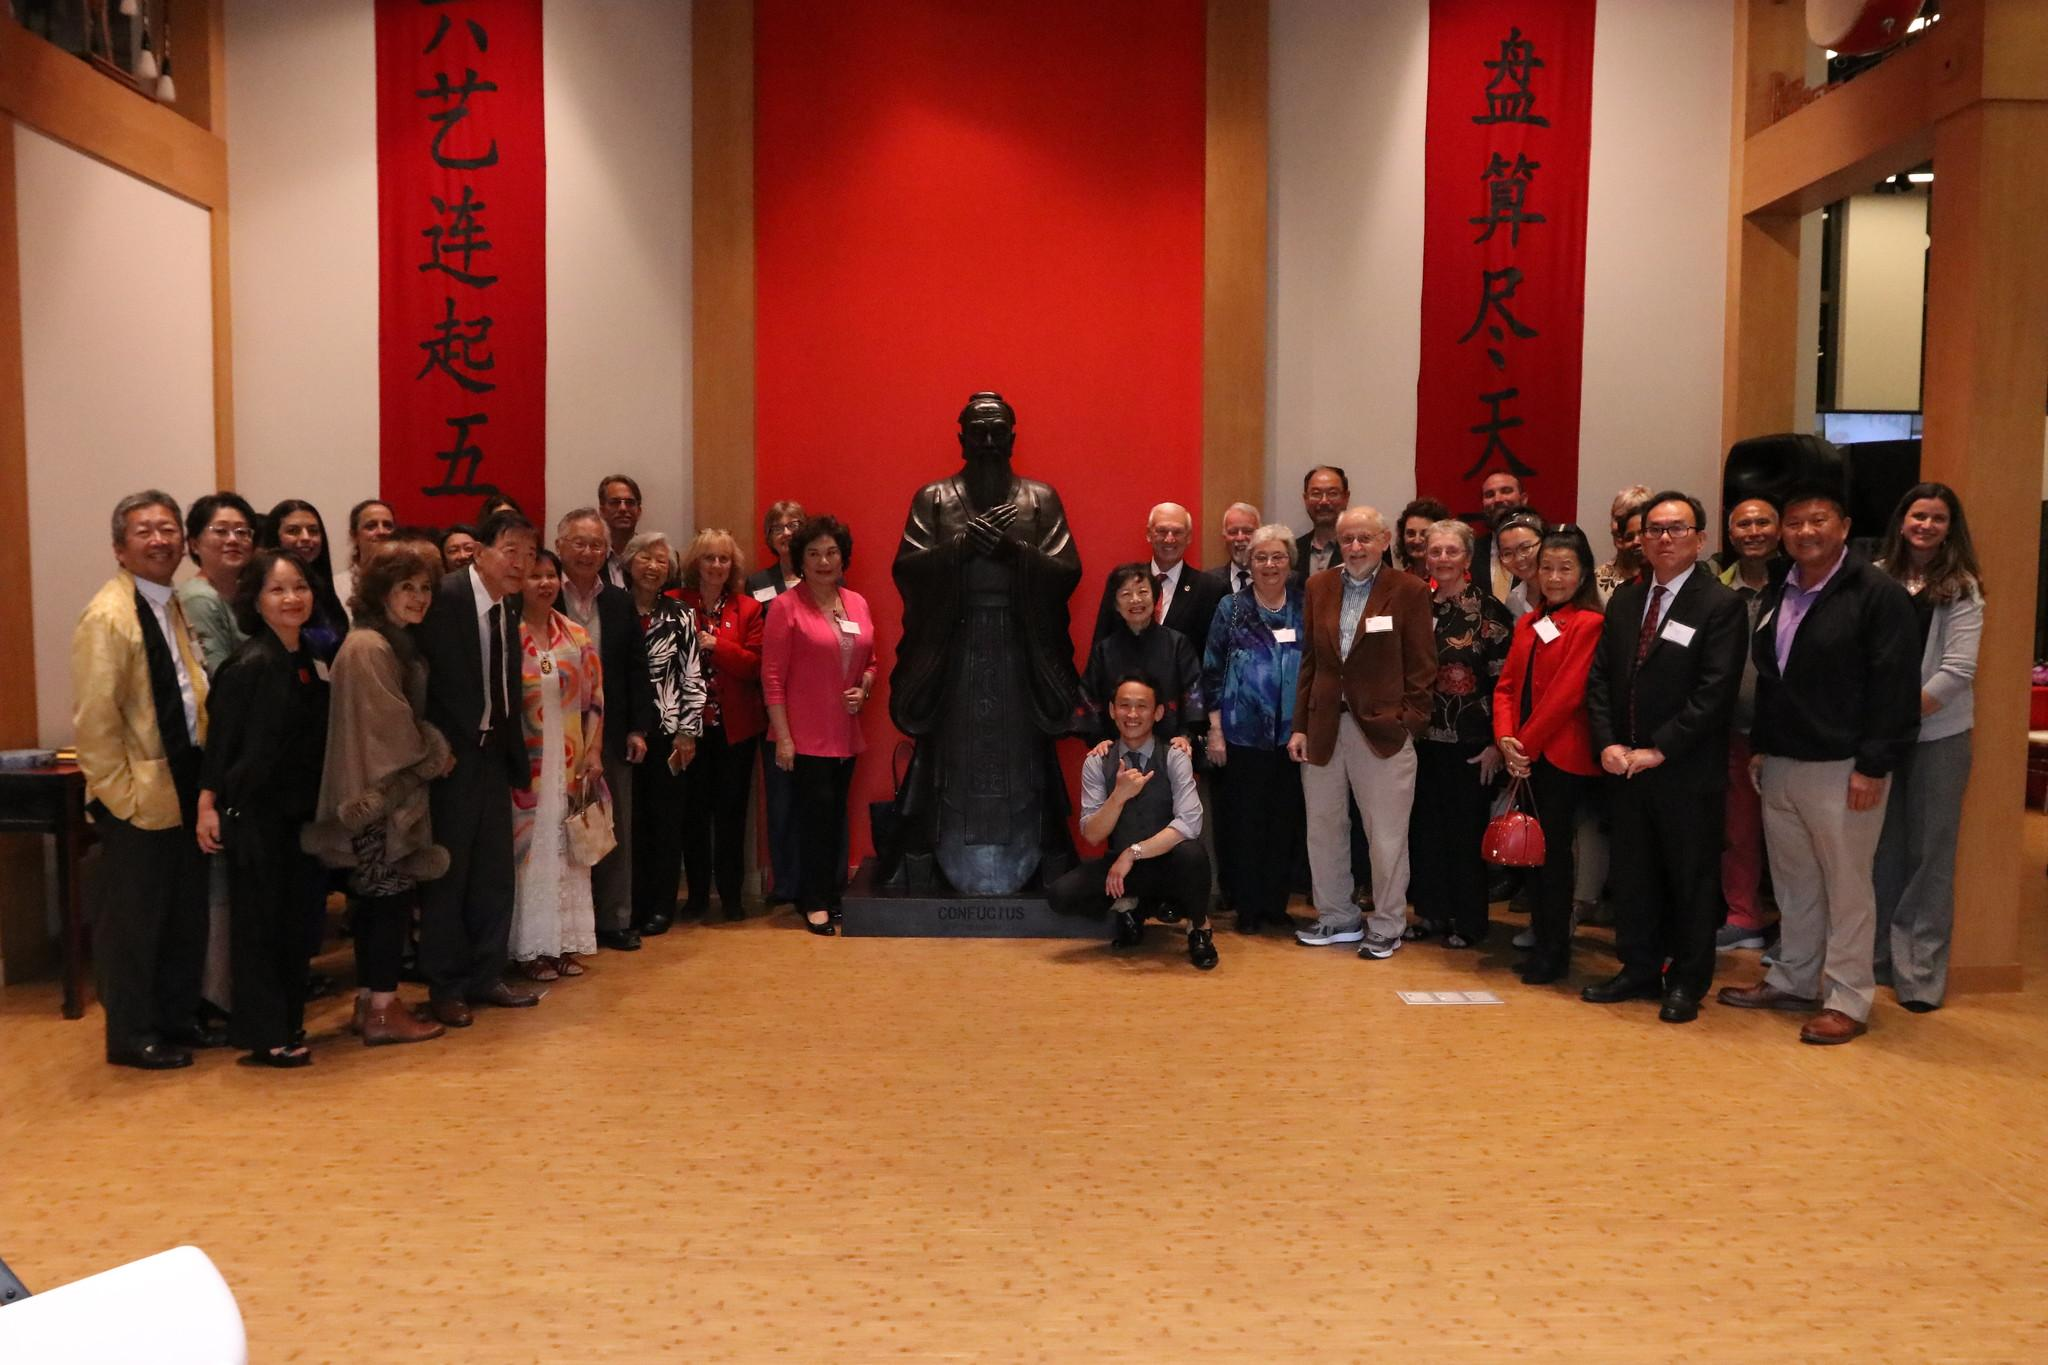 SDSU Chinese Cultural Center